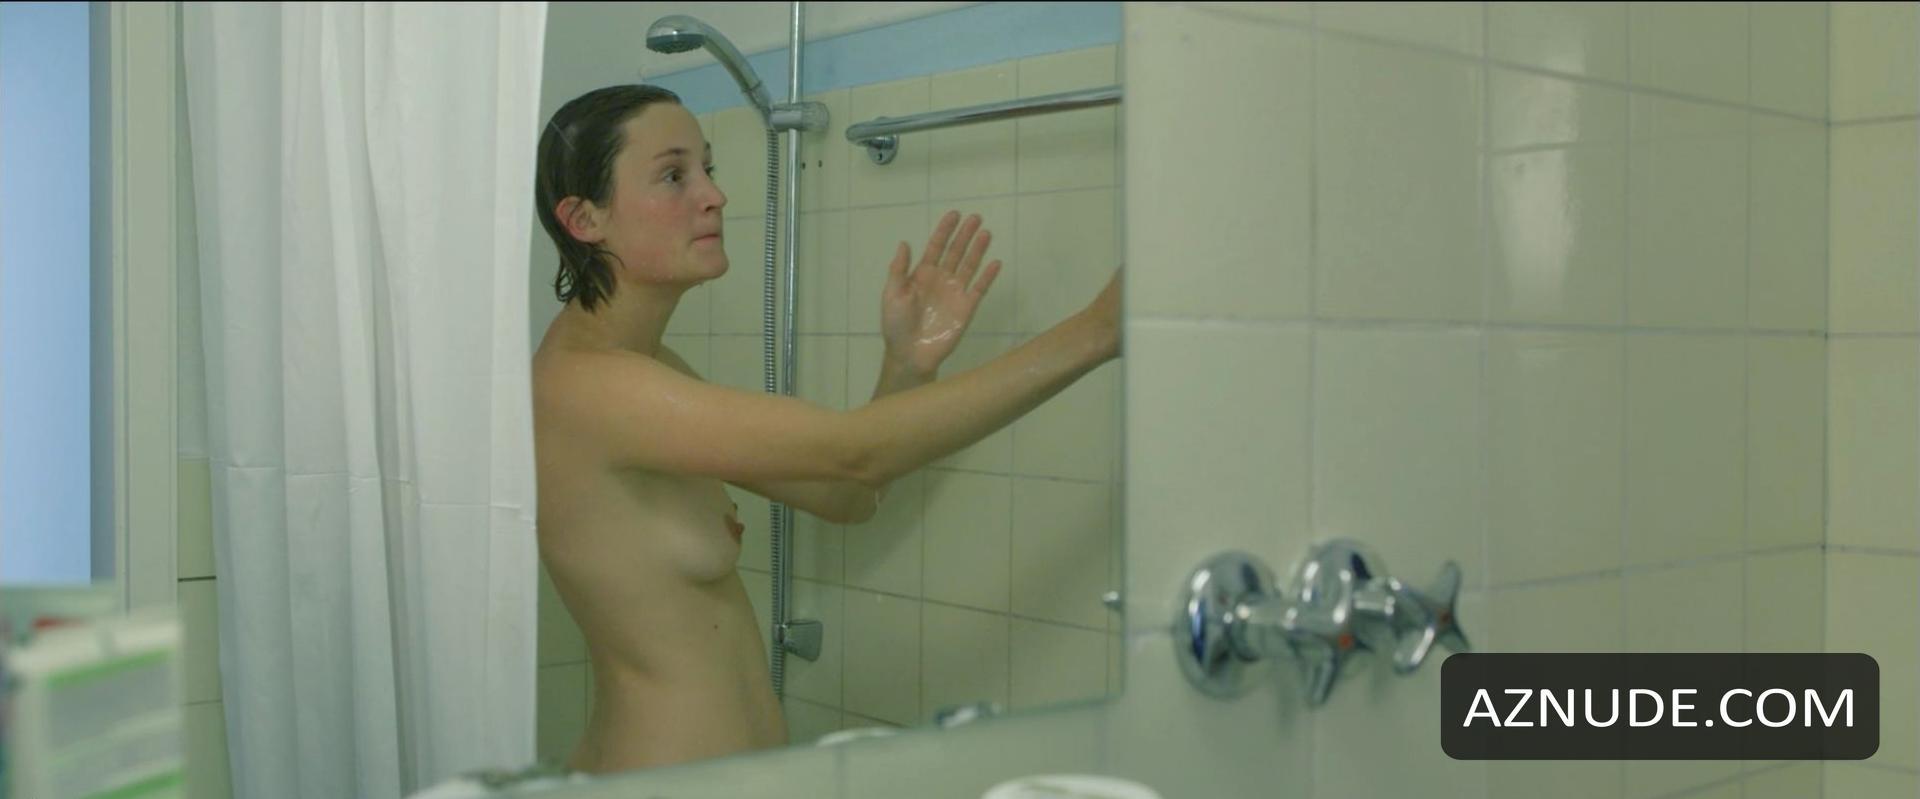 Vicky Krieps Nude - Aznude-8669